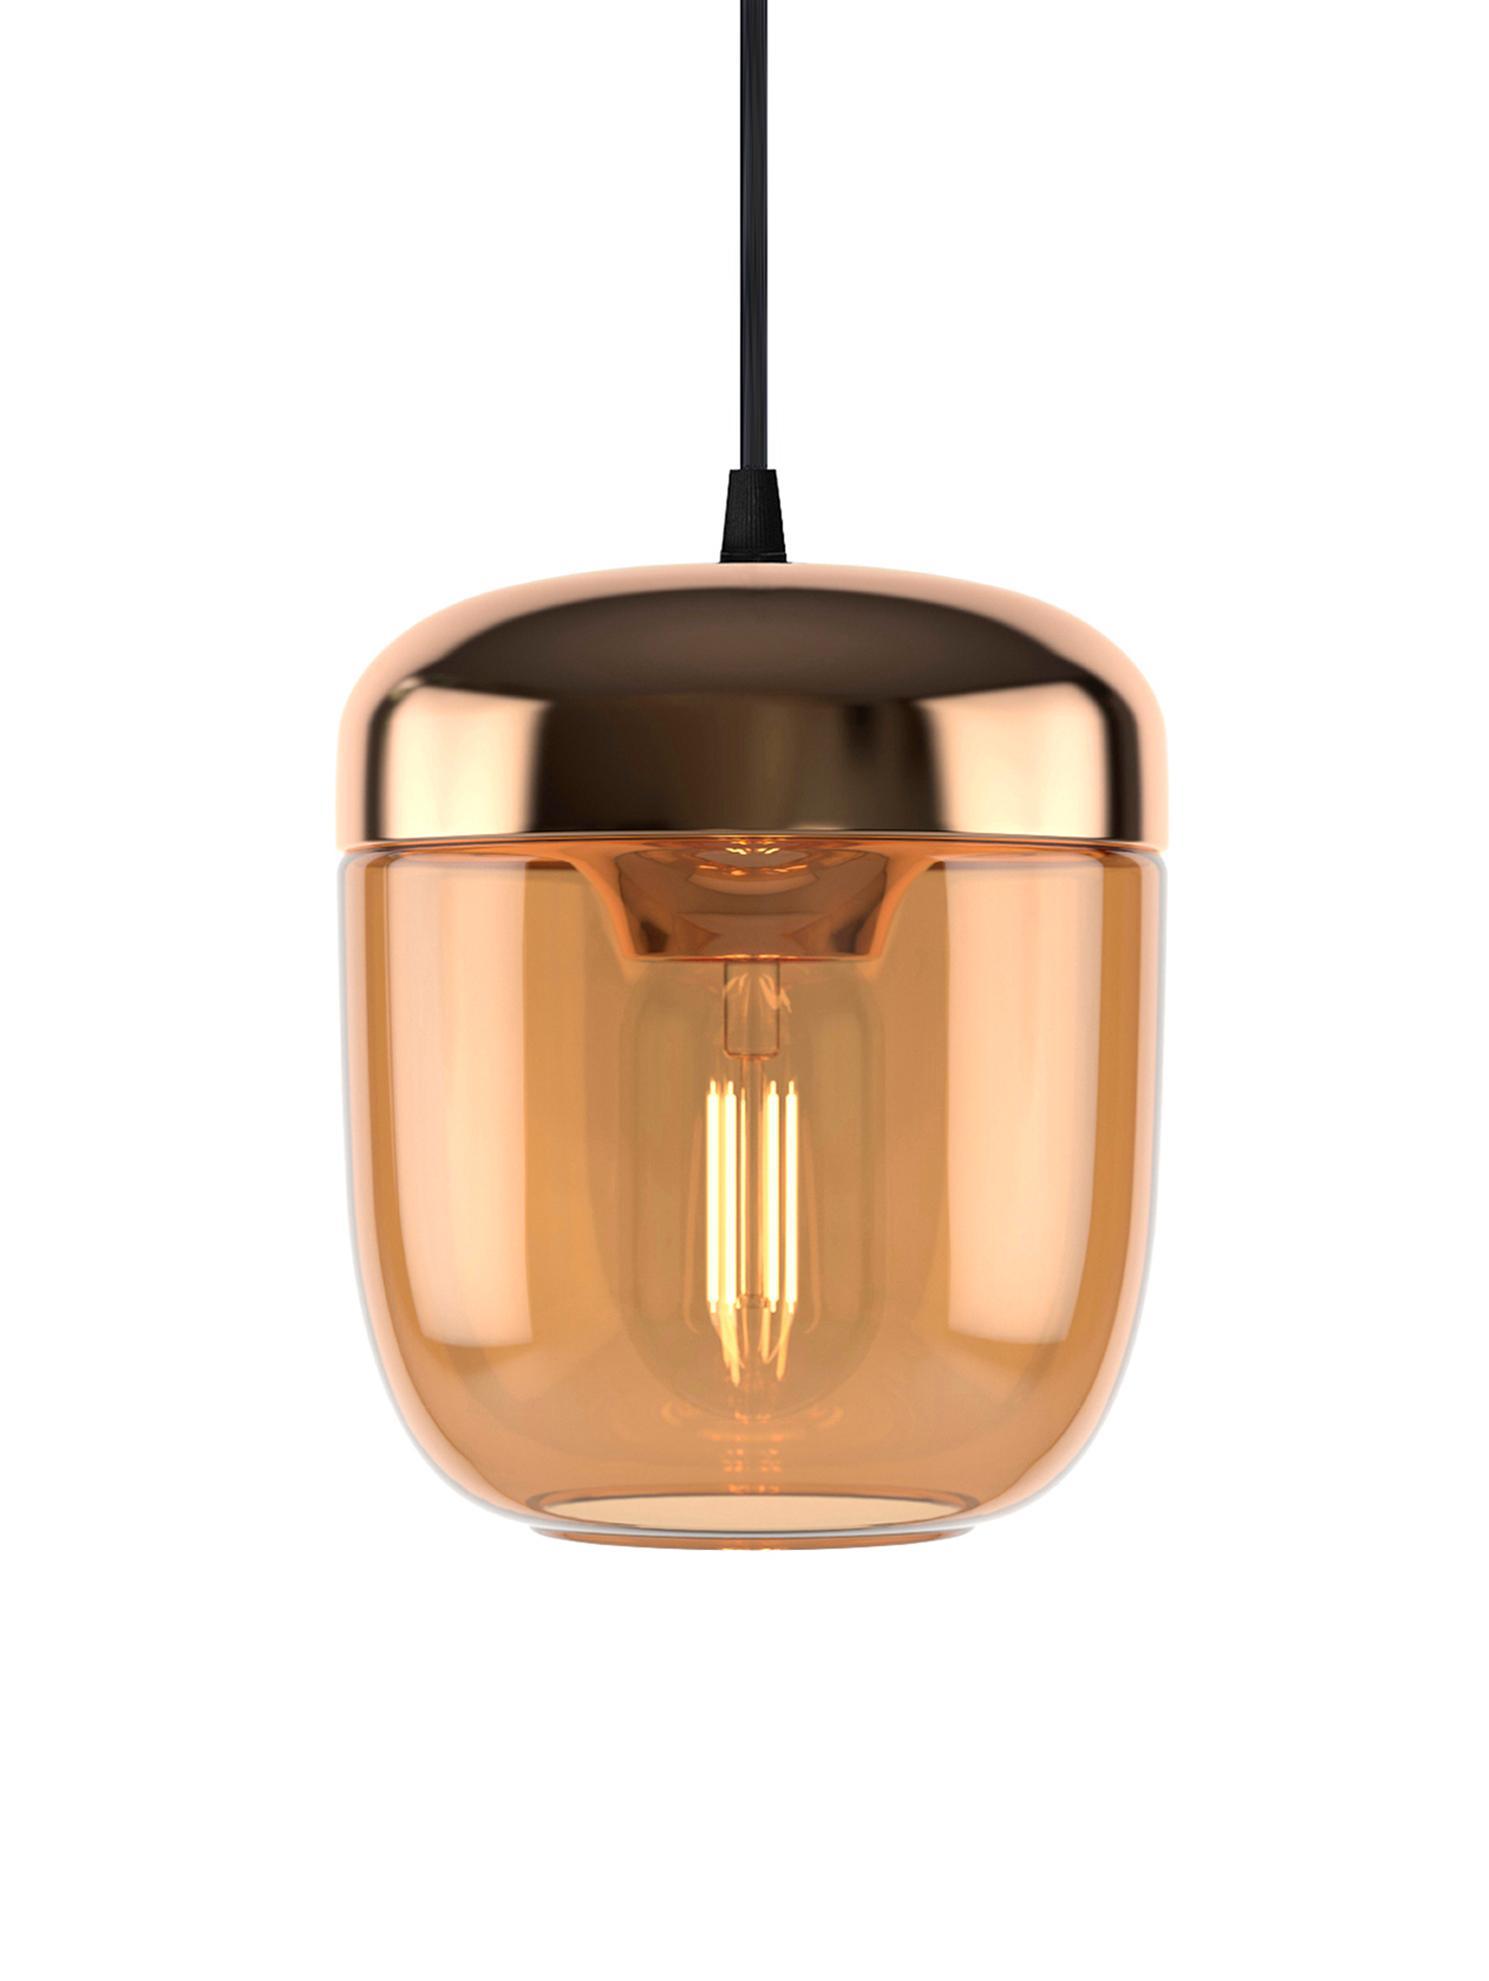 Lampada a sospensione Acorn, Baldacchino: silicone, Rame, ambra, Ø 14 x Alt. 16 cm